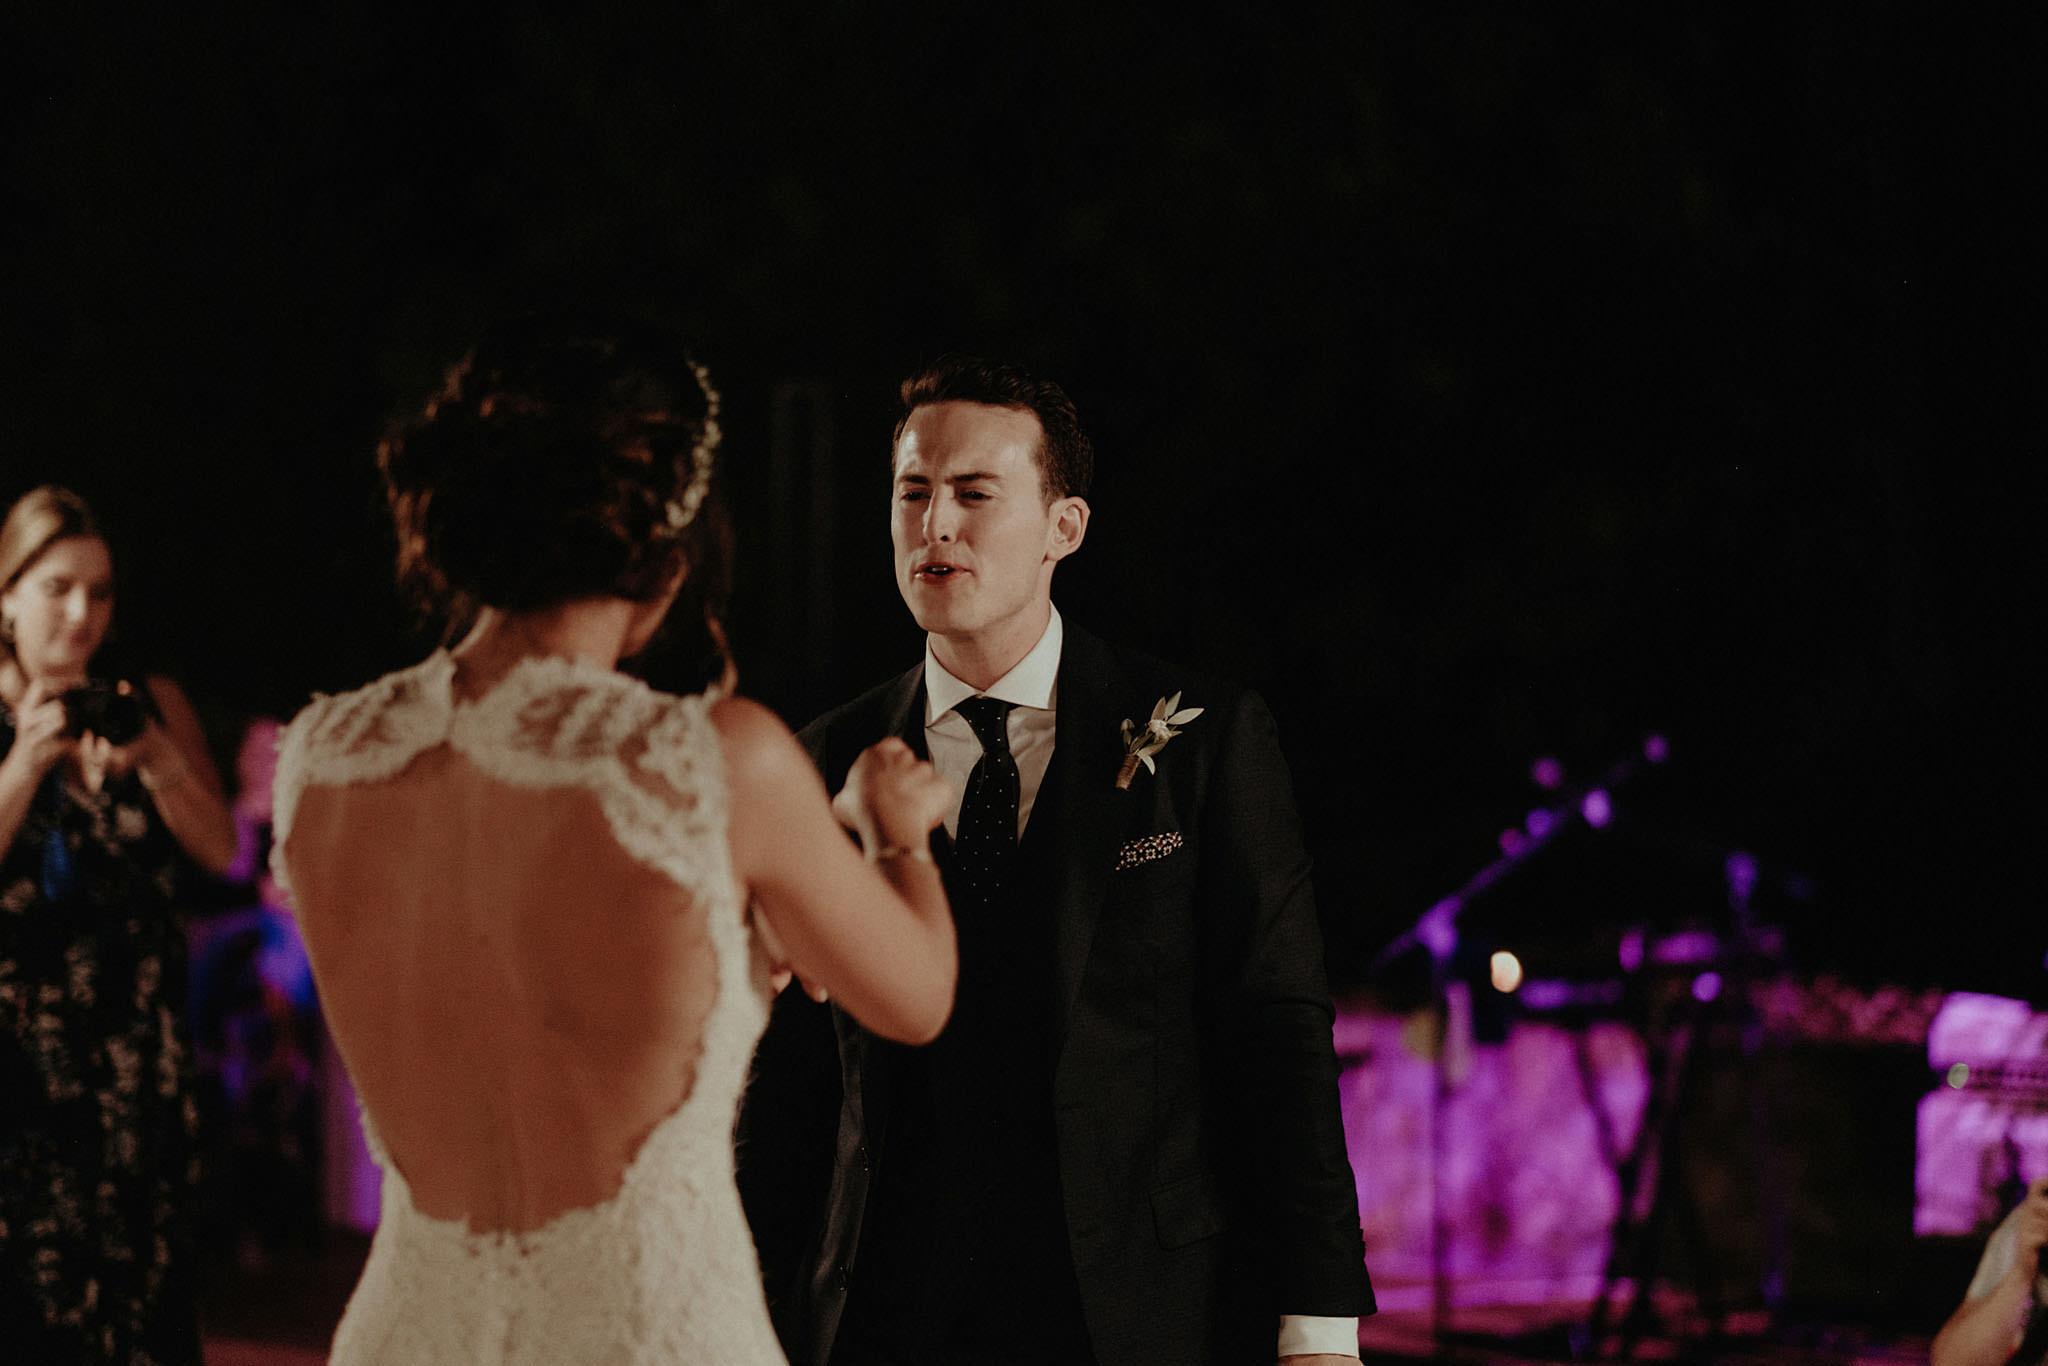 Max-Steph-Italy-Wedding-707.jpg